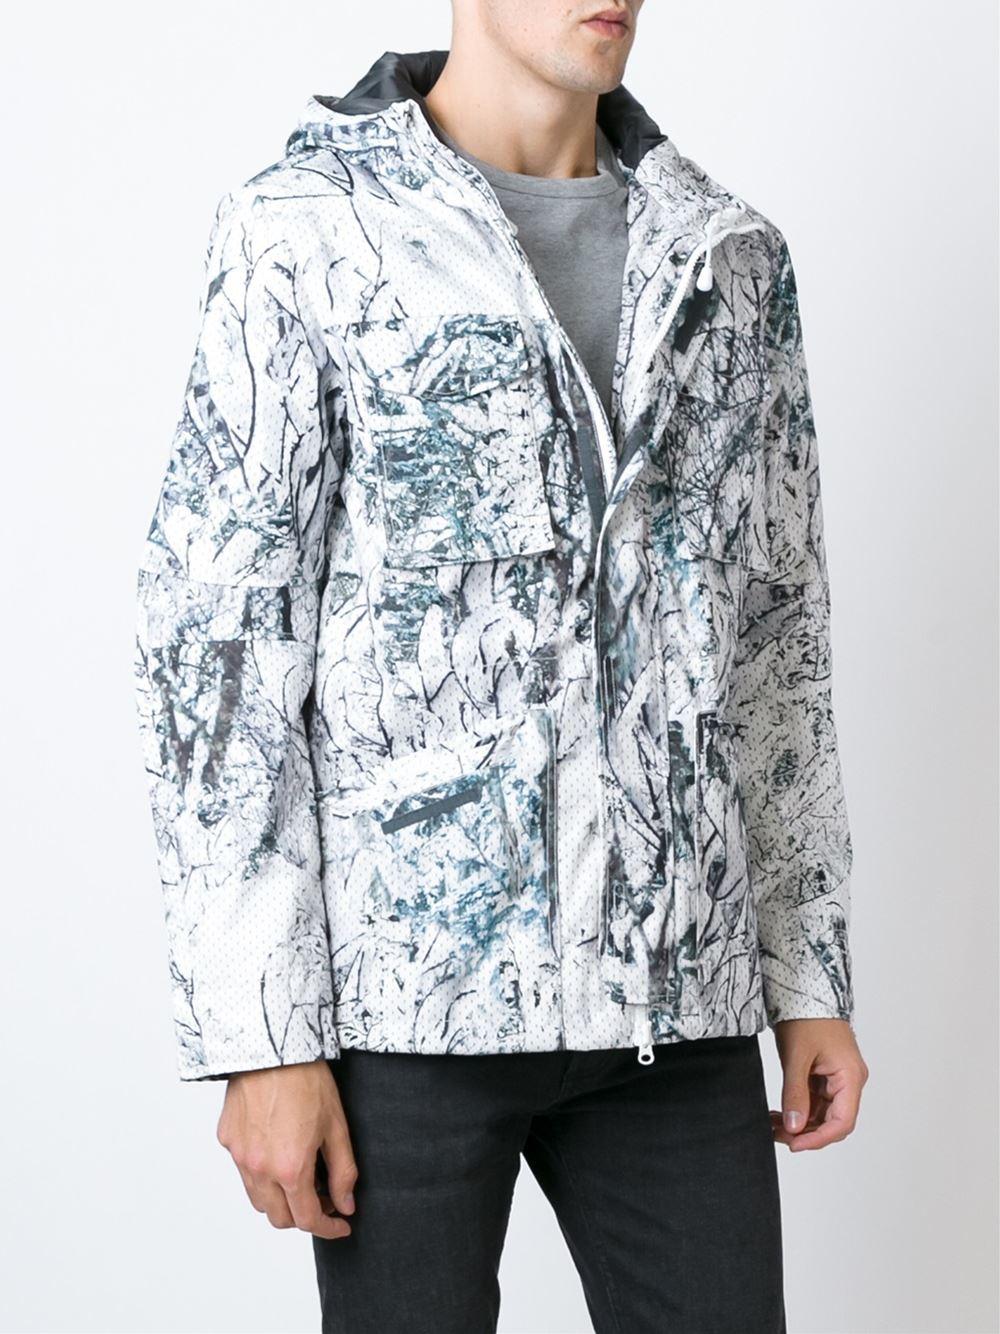 Lyst Adidas Originals Snow Camo Sport Jacket In White